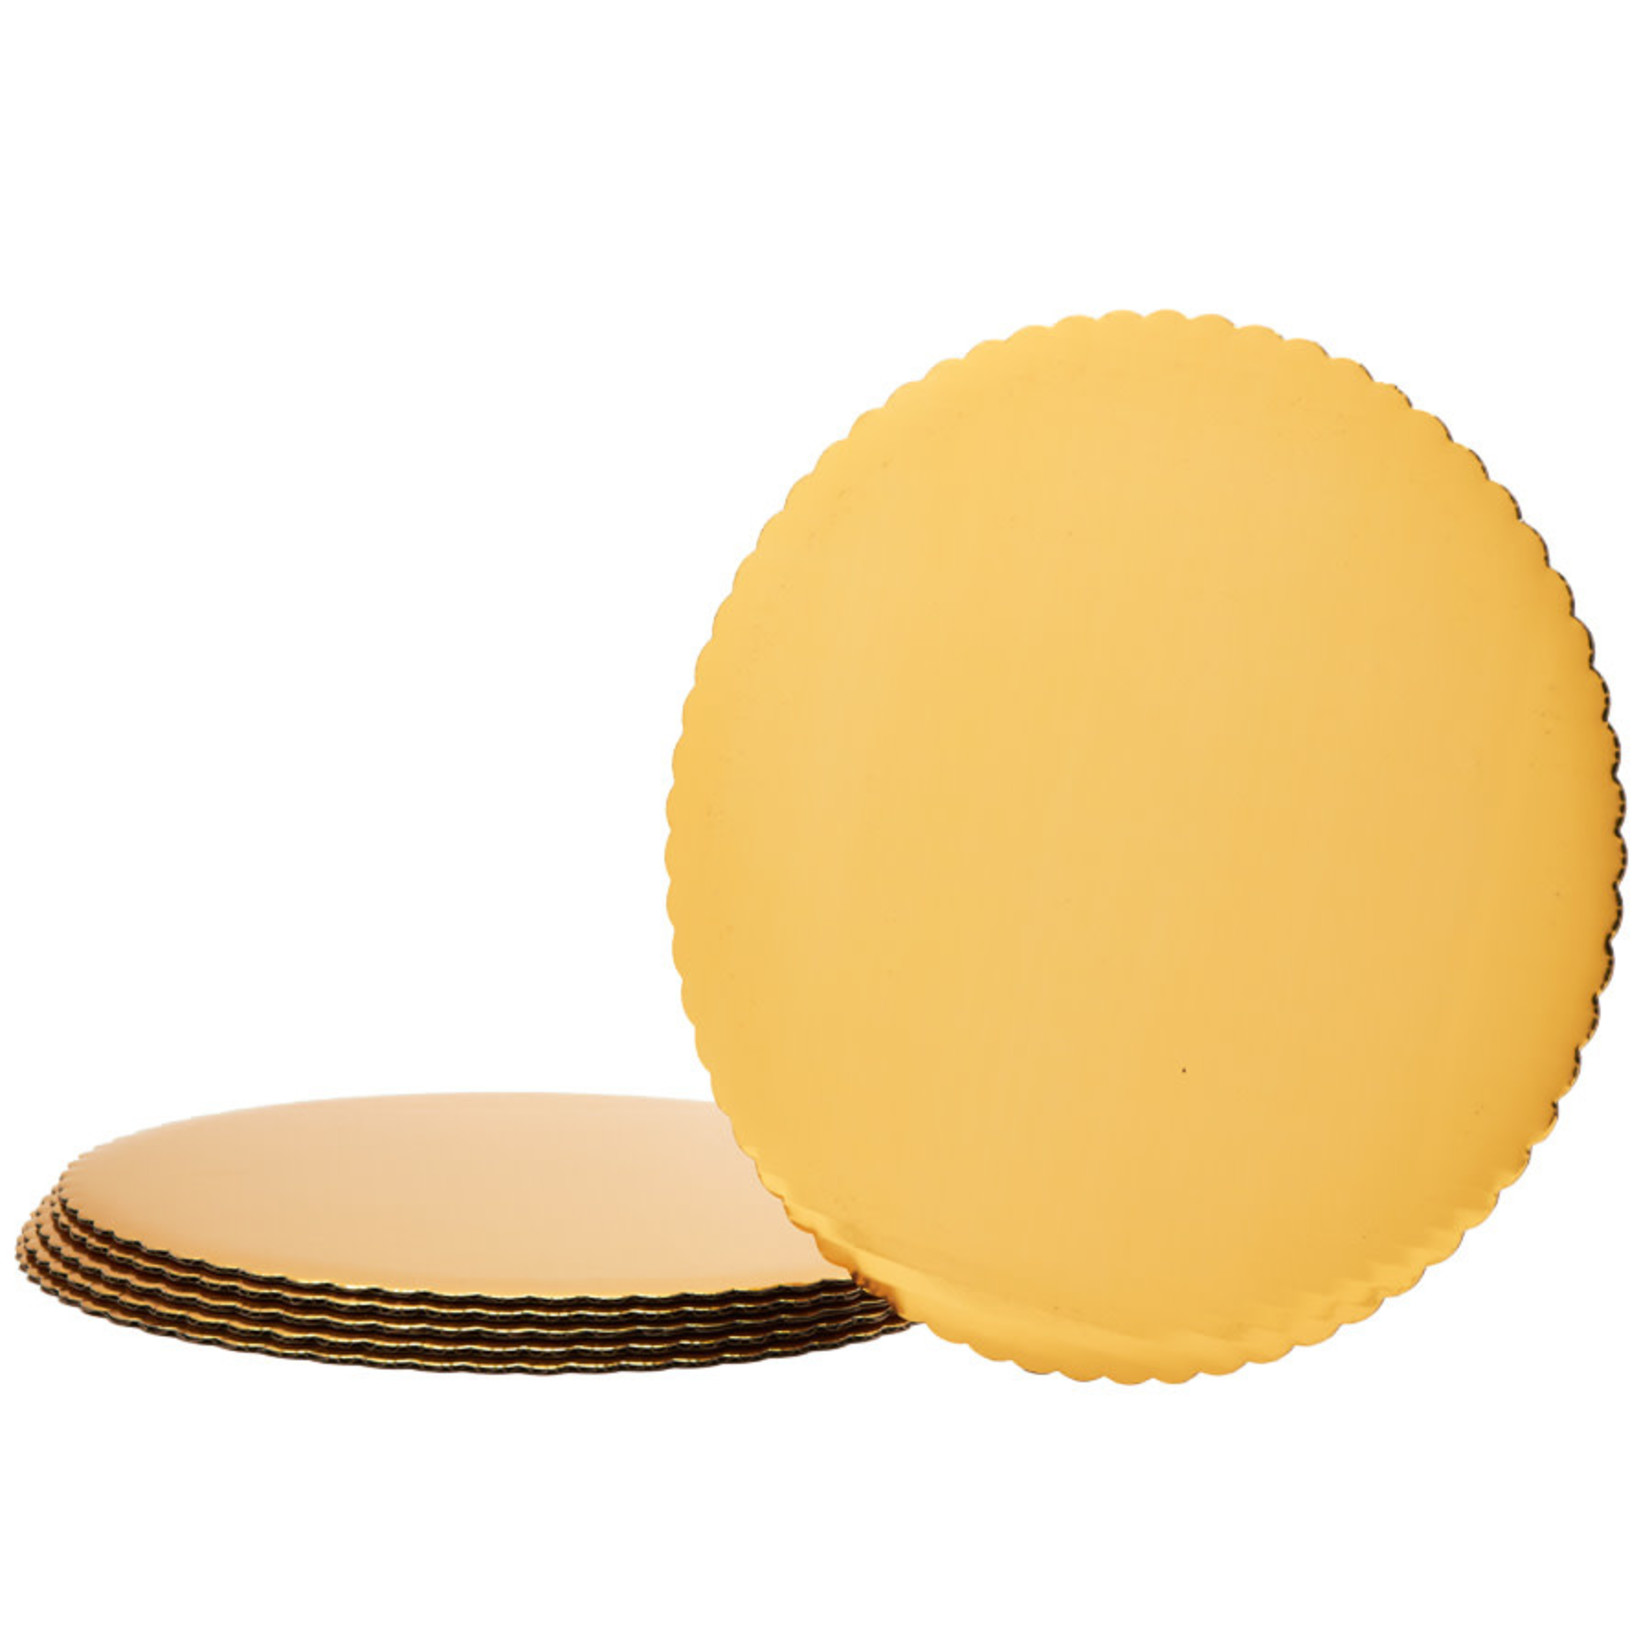 14'', 6 PK GOLD FOIL COVERED CAKEBOARD